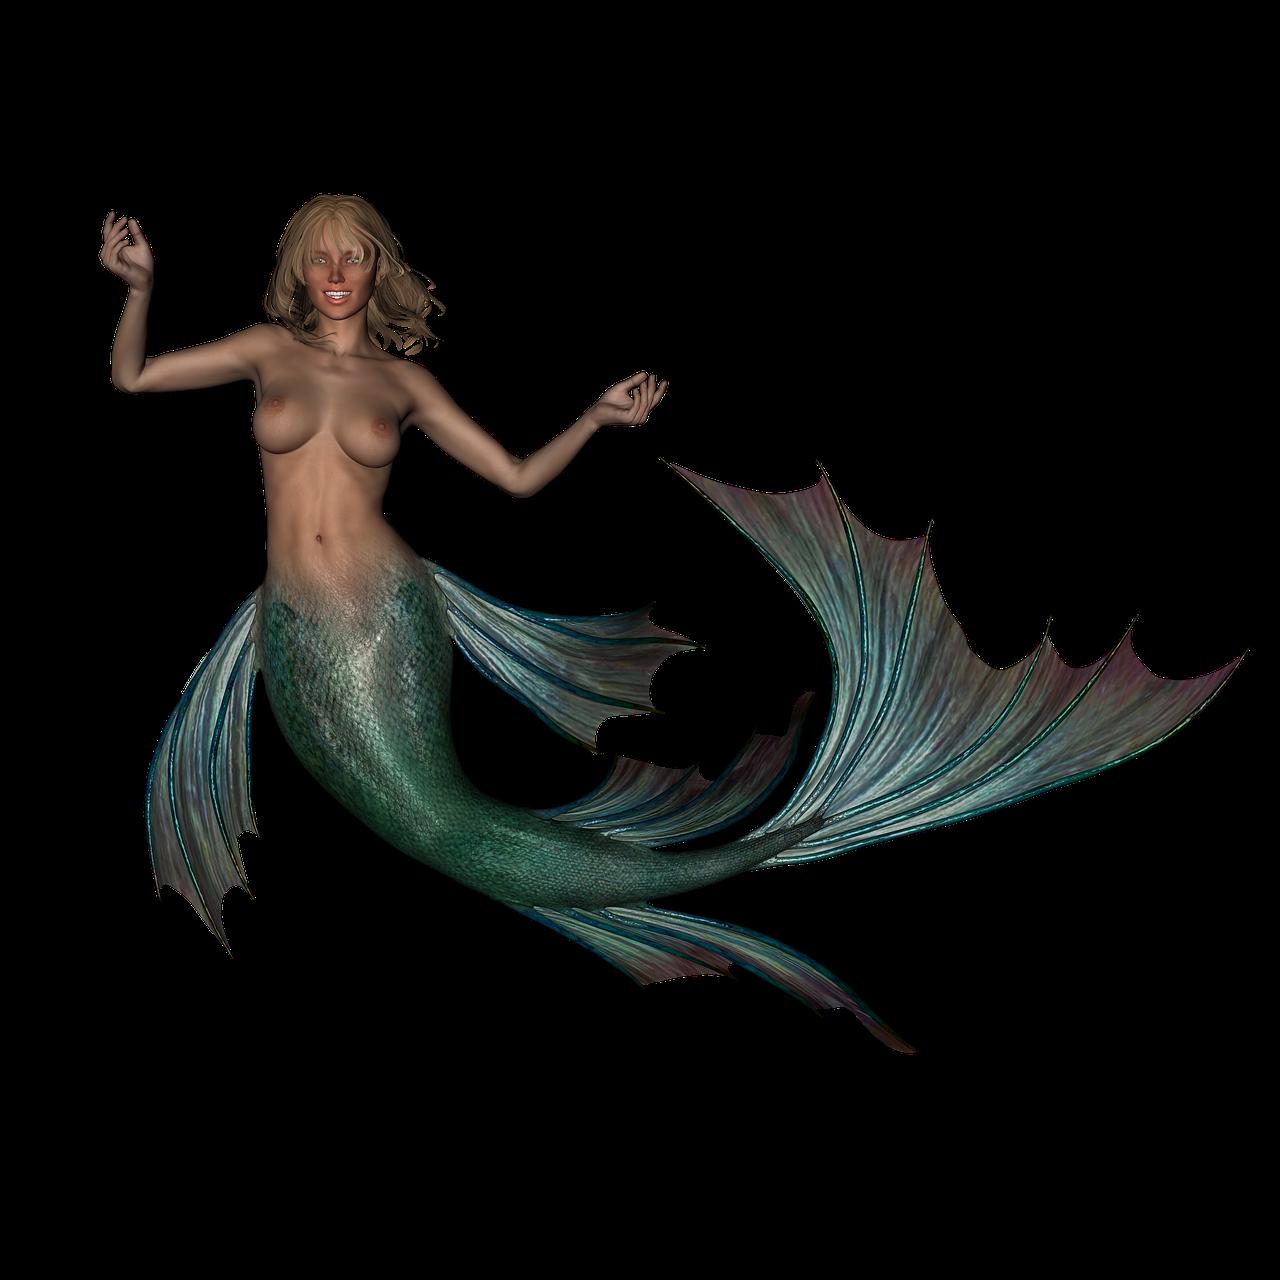 Nude mermaid art mermaid print nautical themed coral